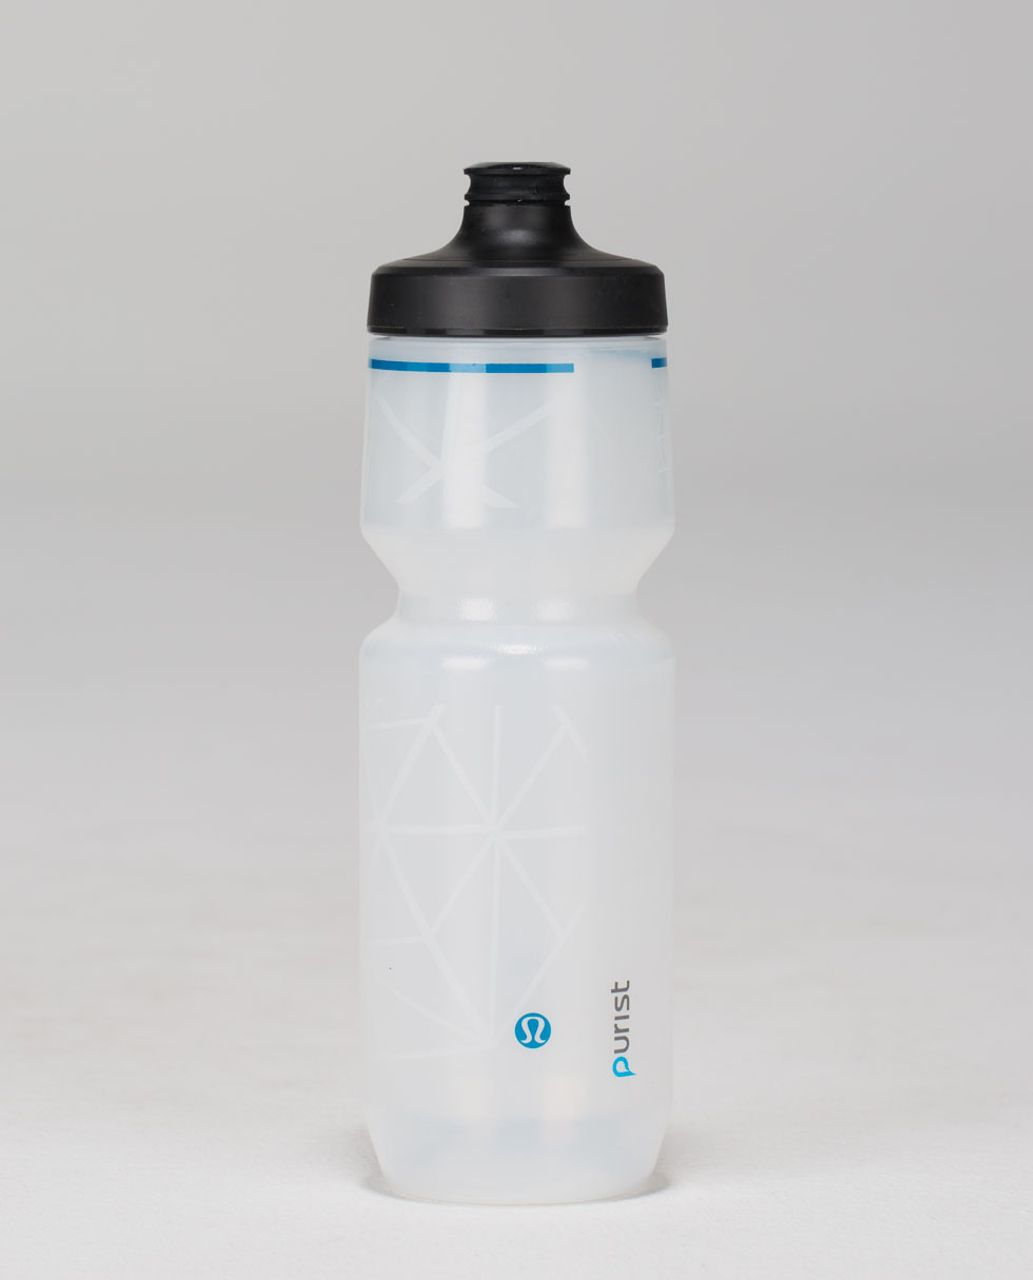 Lululemon Purist Cycling Water Bottle - Harageo Cube Translucent